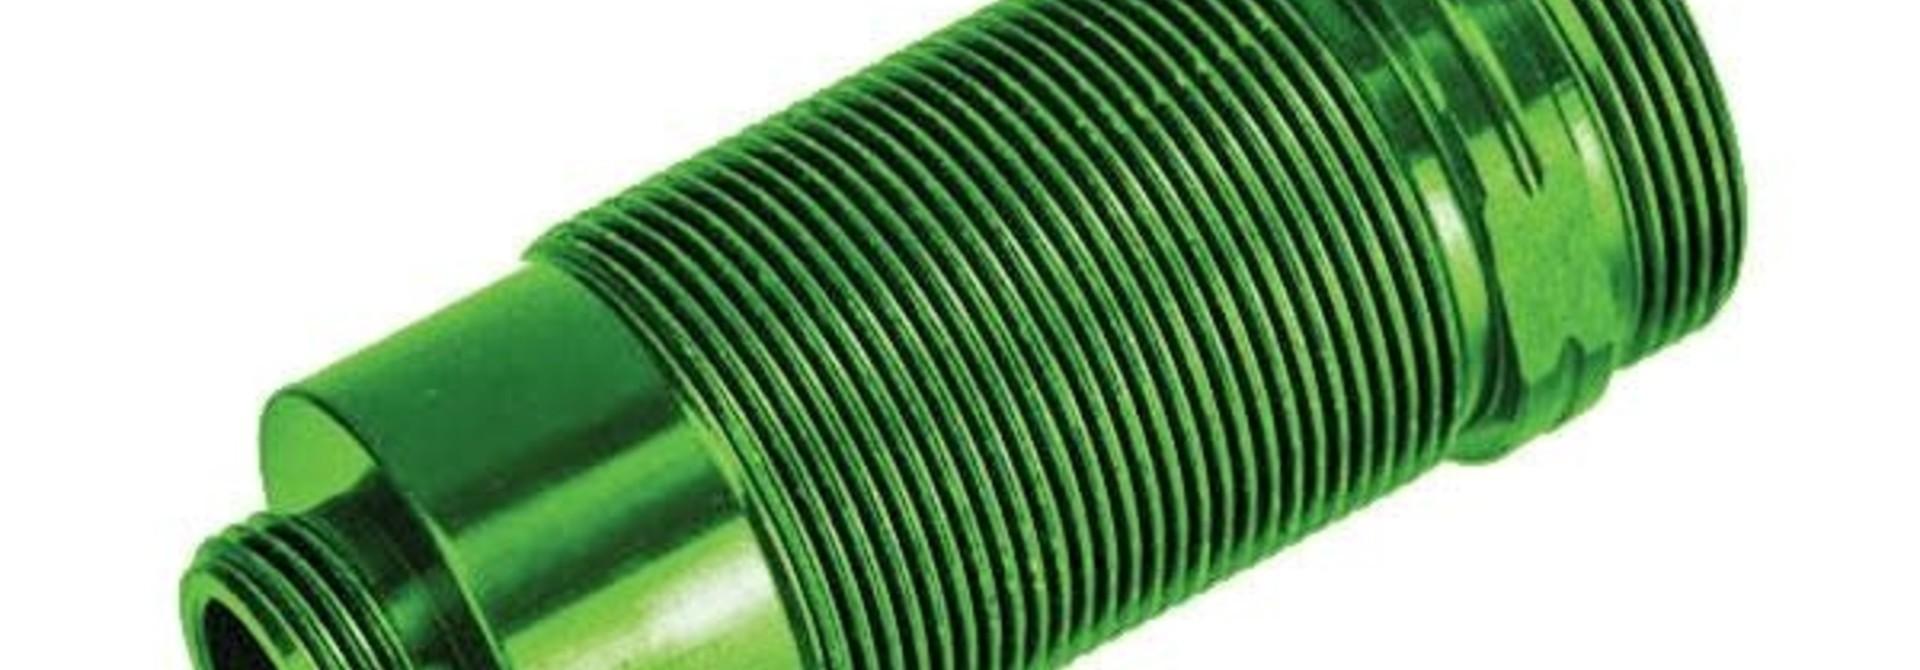 Body, GTR long shock, aluminum (green-a nodized) (PTFE-coated bodies) (1)